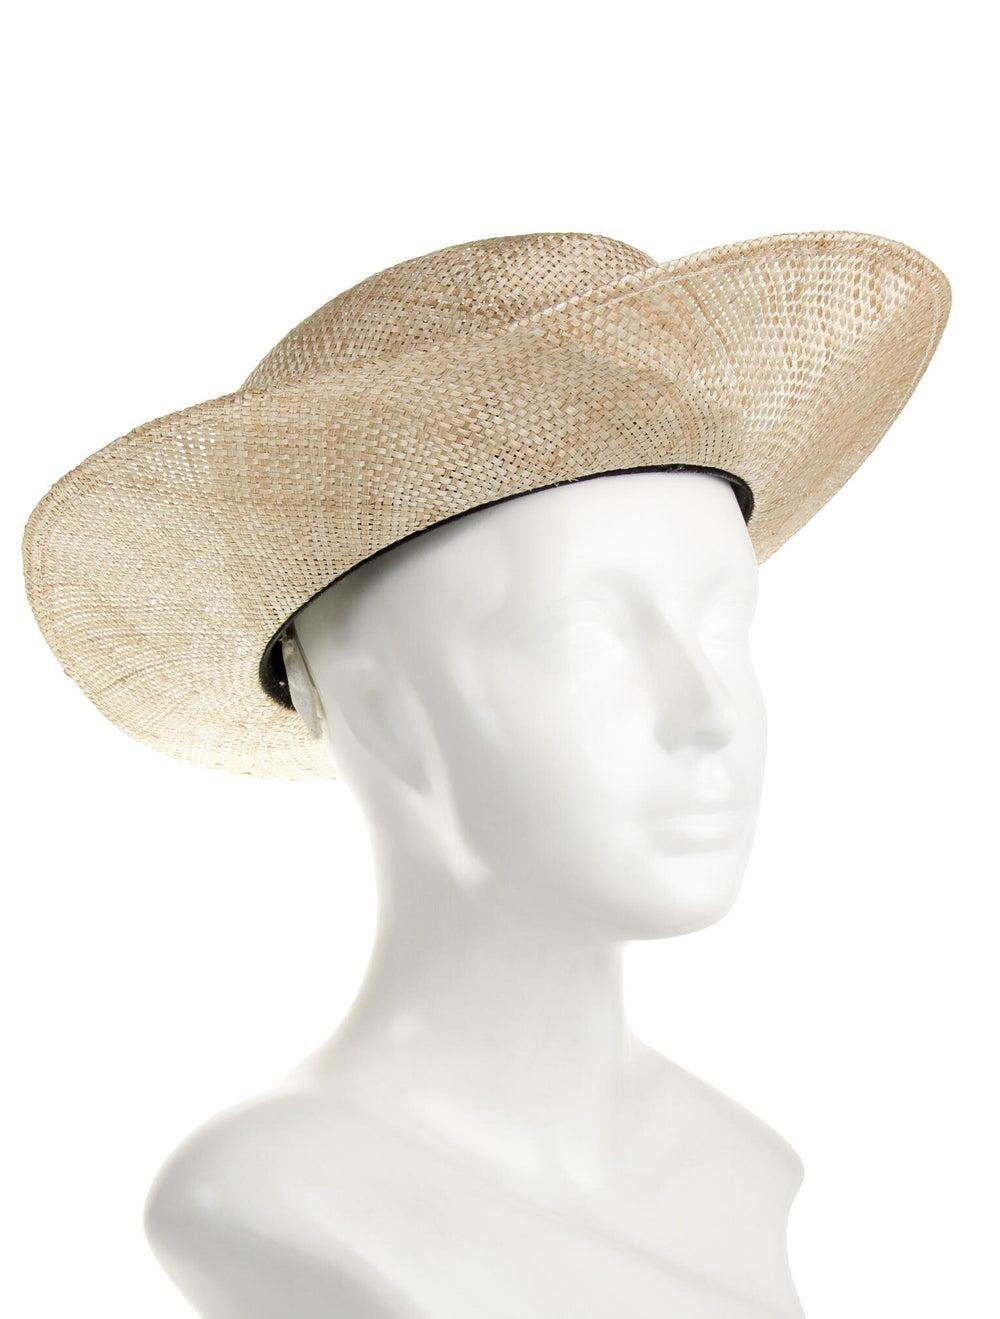 Janessa Leone Straw Hat black - image 3